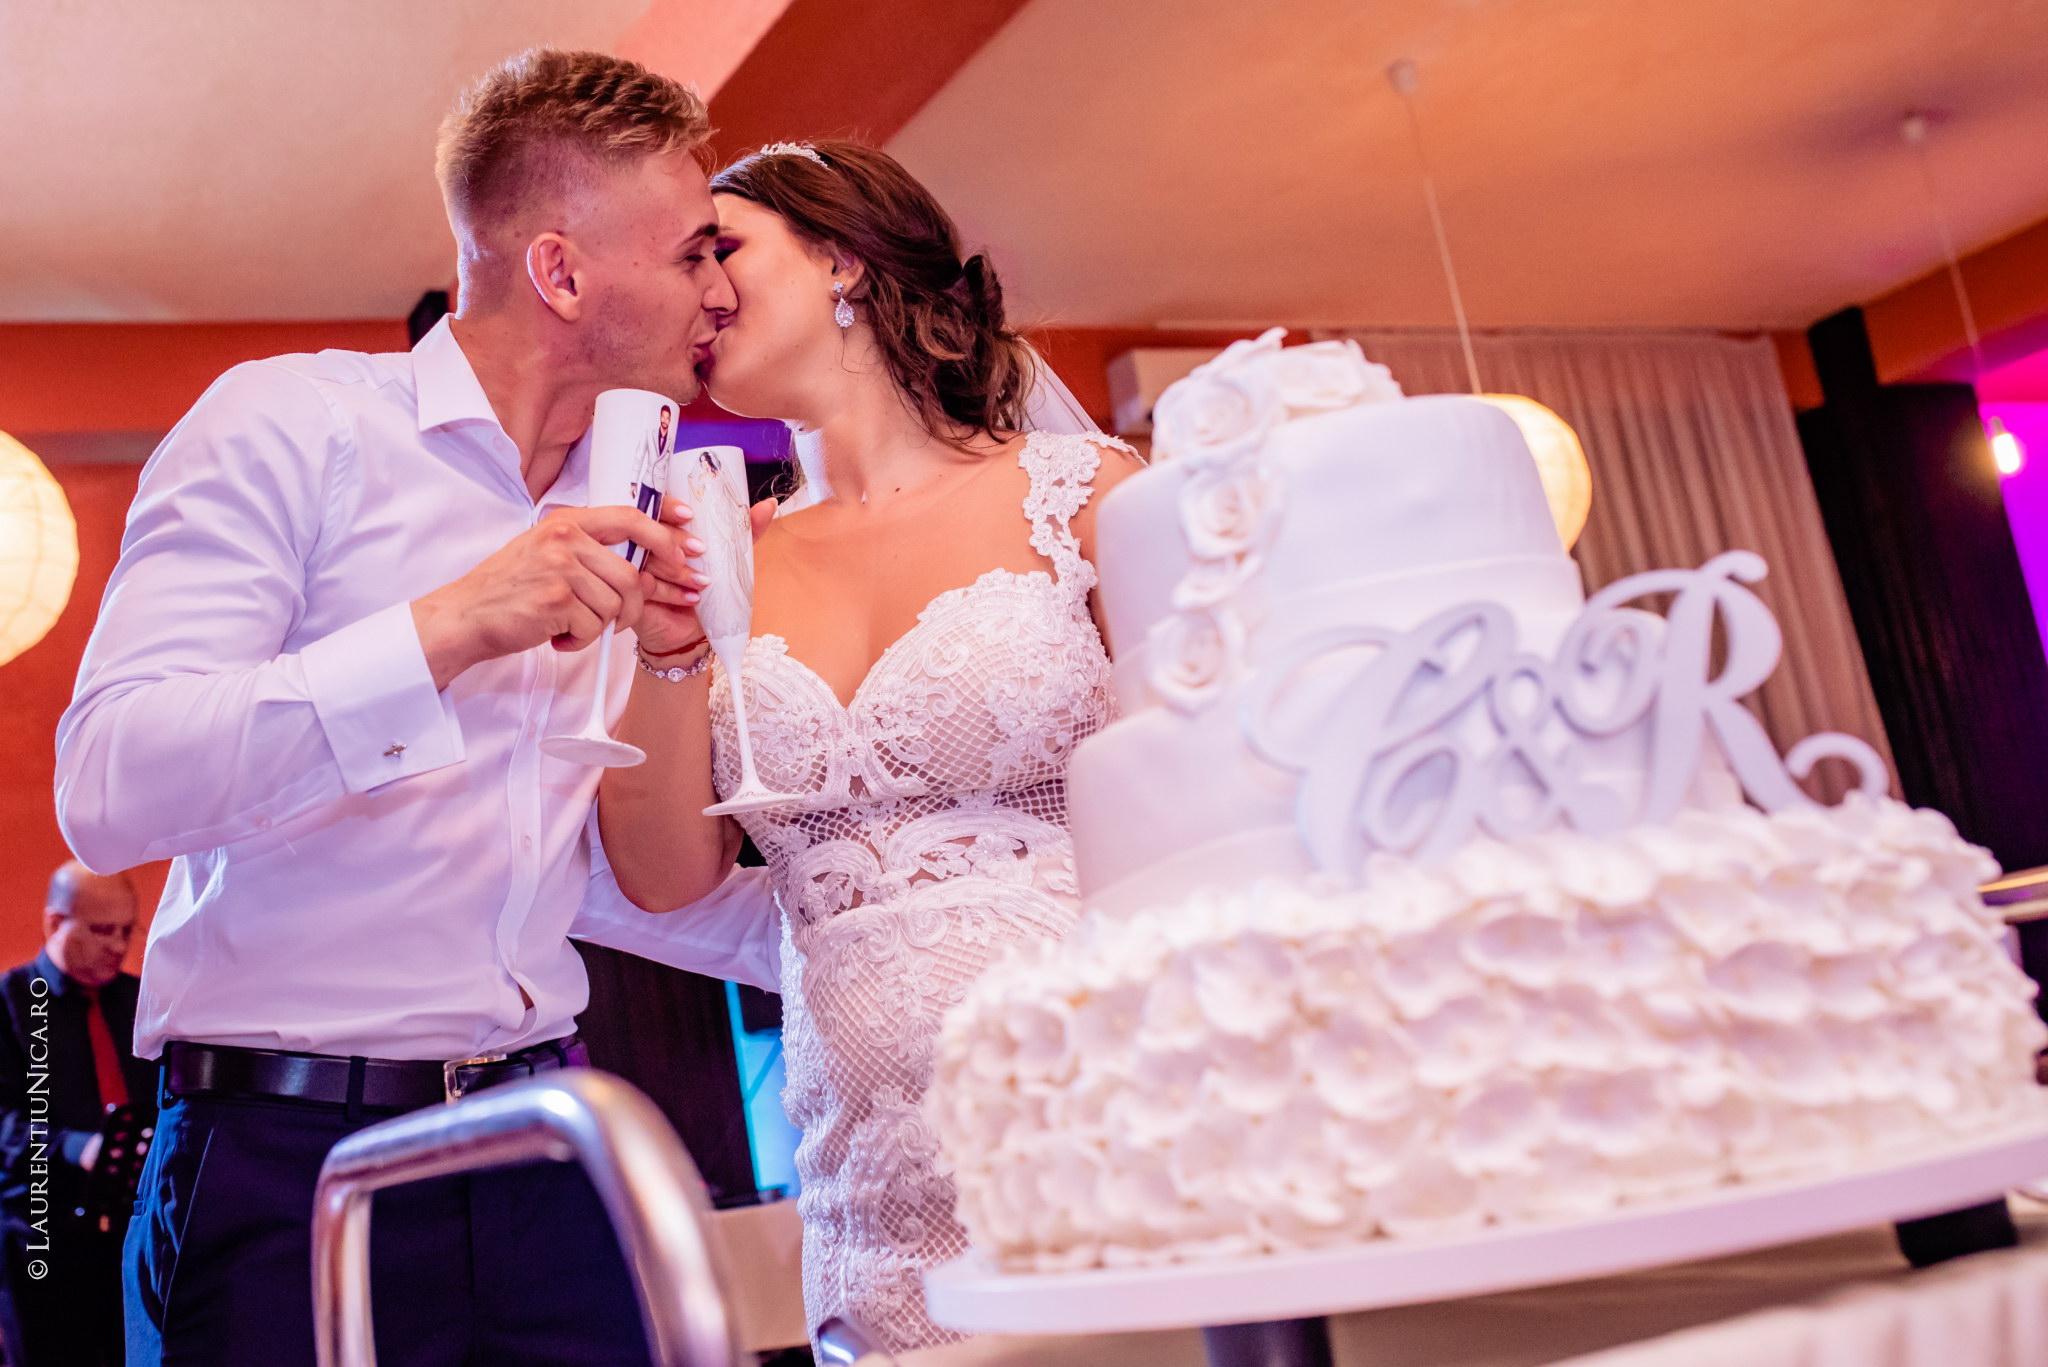 fotografii nunta Roxana si Cosmin fotograf nunta laurentiu nica 43 - Roxana & Cosmin | Fotografii nunta | Ticleni, judetul Gorj